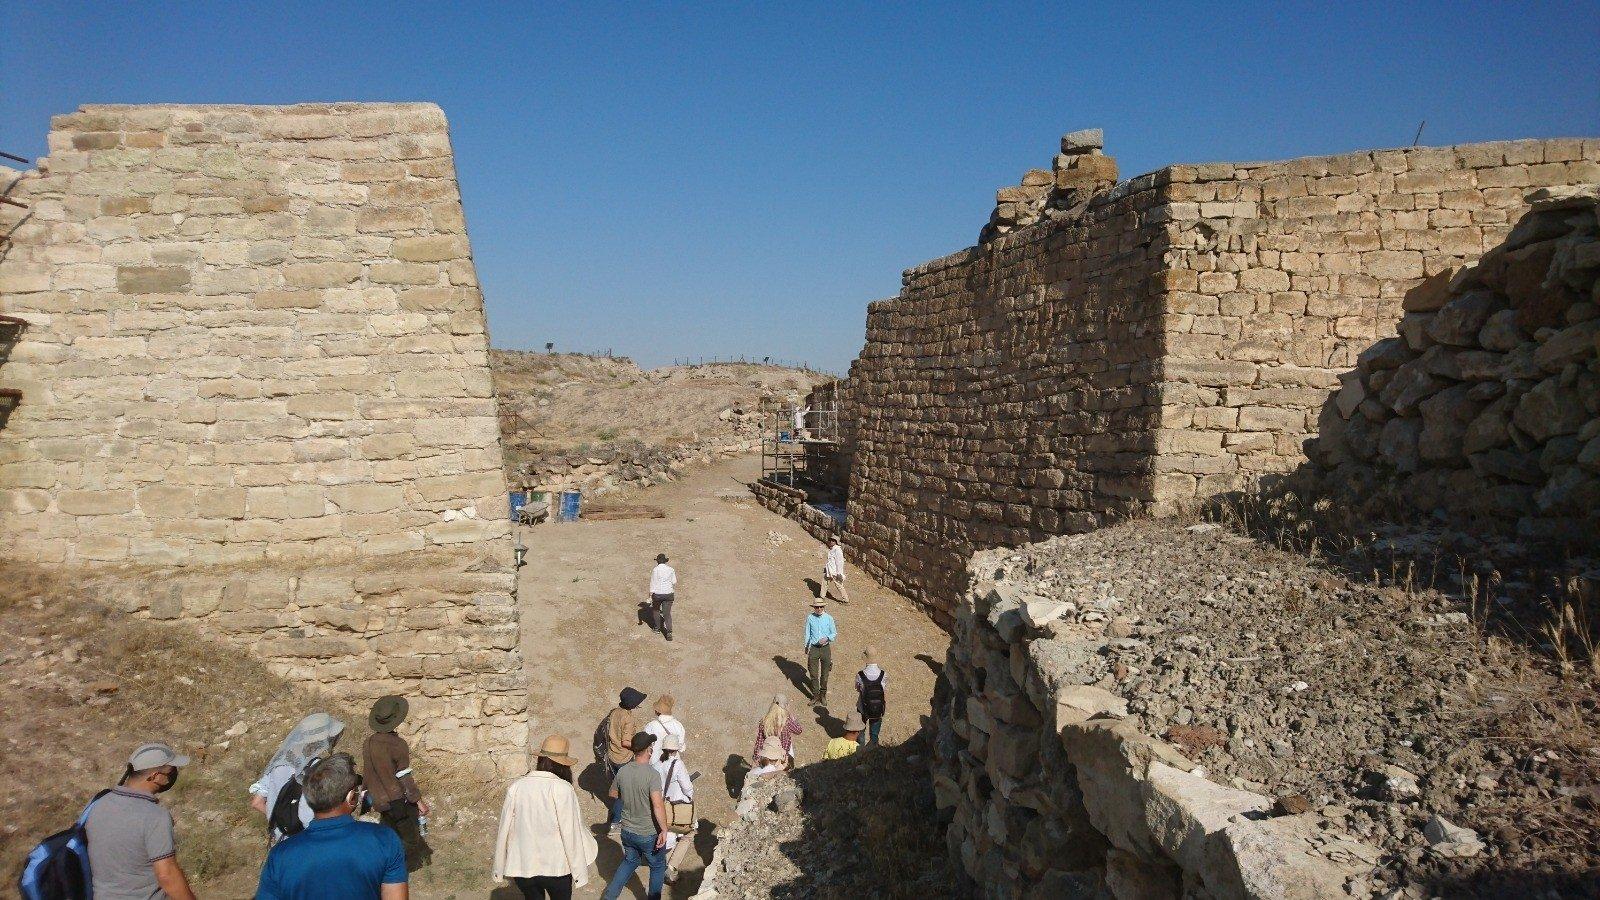 The ICOMOS committee examines the ancient city of Gordion, Ankara, Turkey, Aug. 12, 2021. (AA Photo)